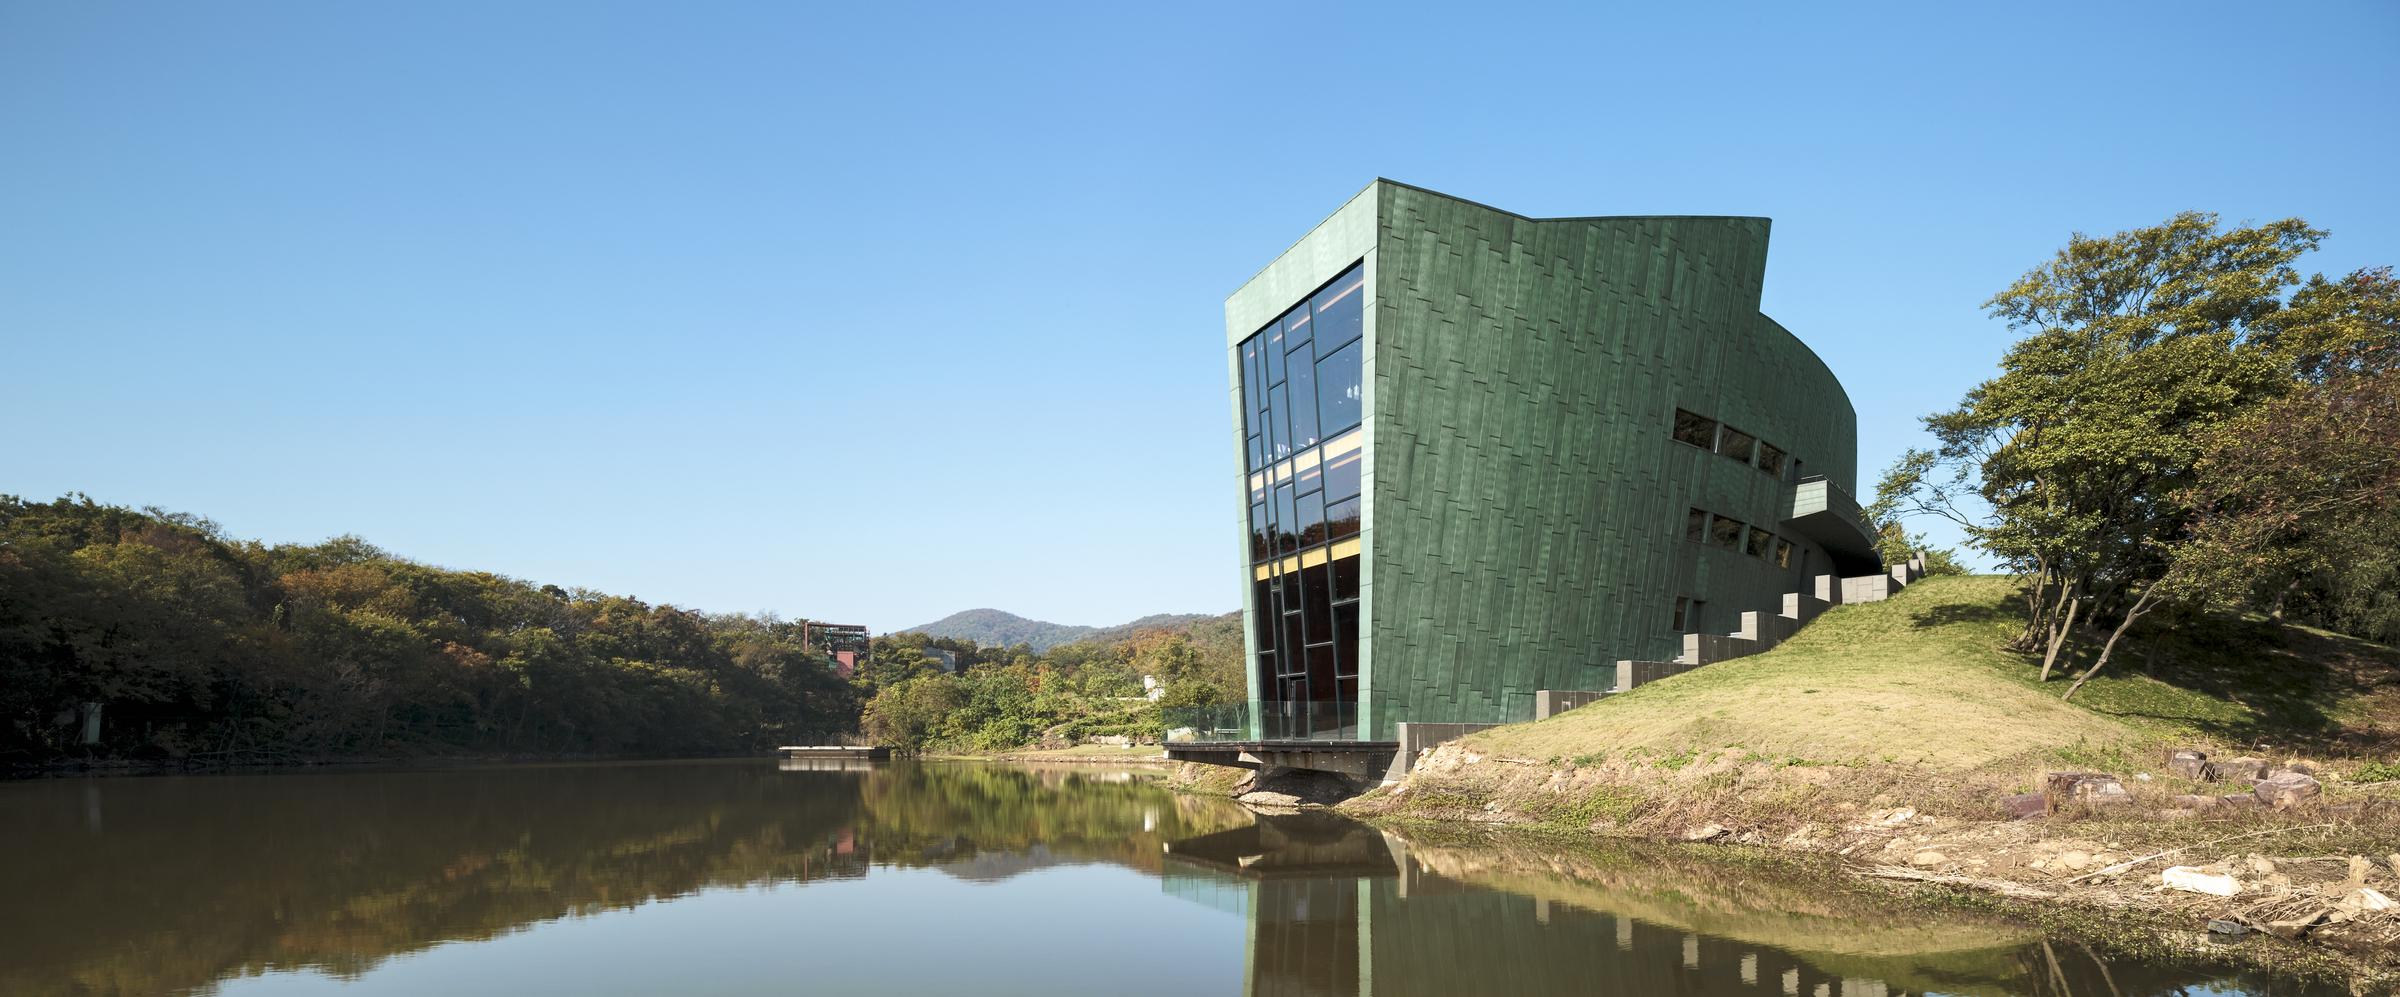 Sanaksenaho Architects: CIPEA Villa in Nanjing, China. Designed 2003-04 , built 2012. Photo: Tuomas Uusheimo